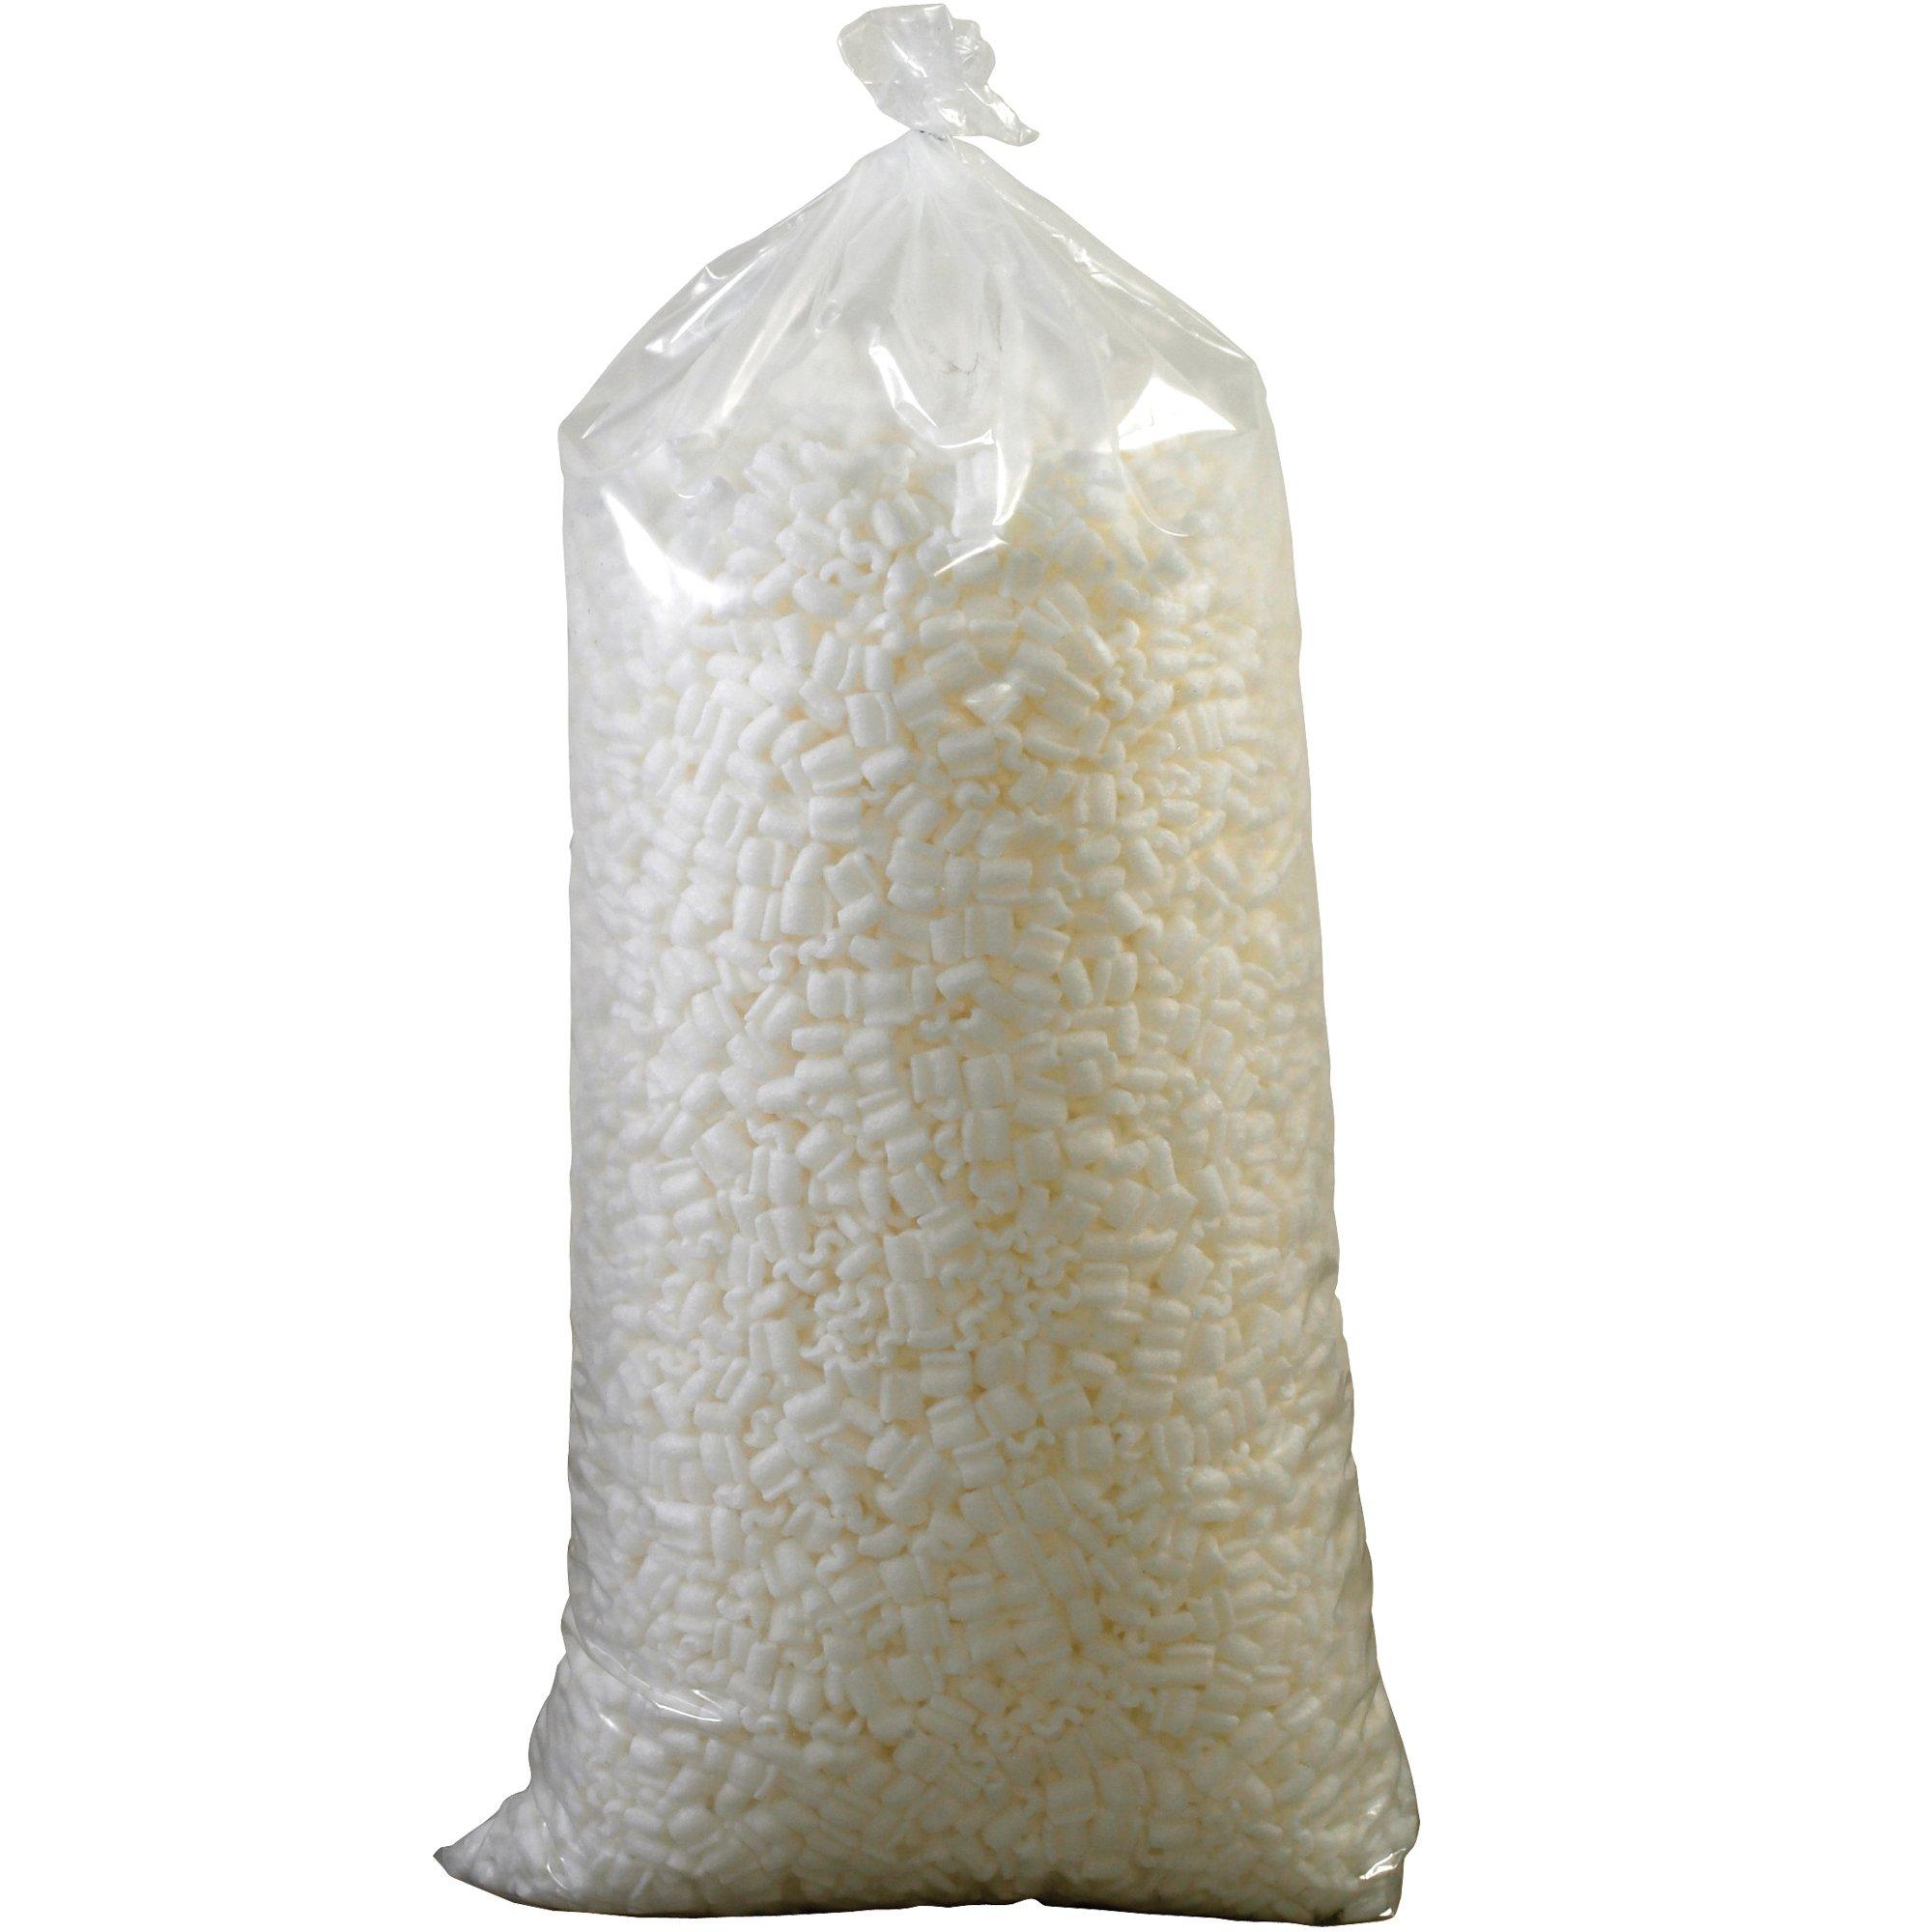 Aviditi Environmentally Friendly Loose-Fill, 7 Cubic Feet, White, (Pack of 1) by Aviditi